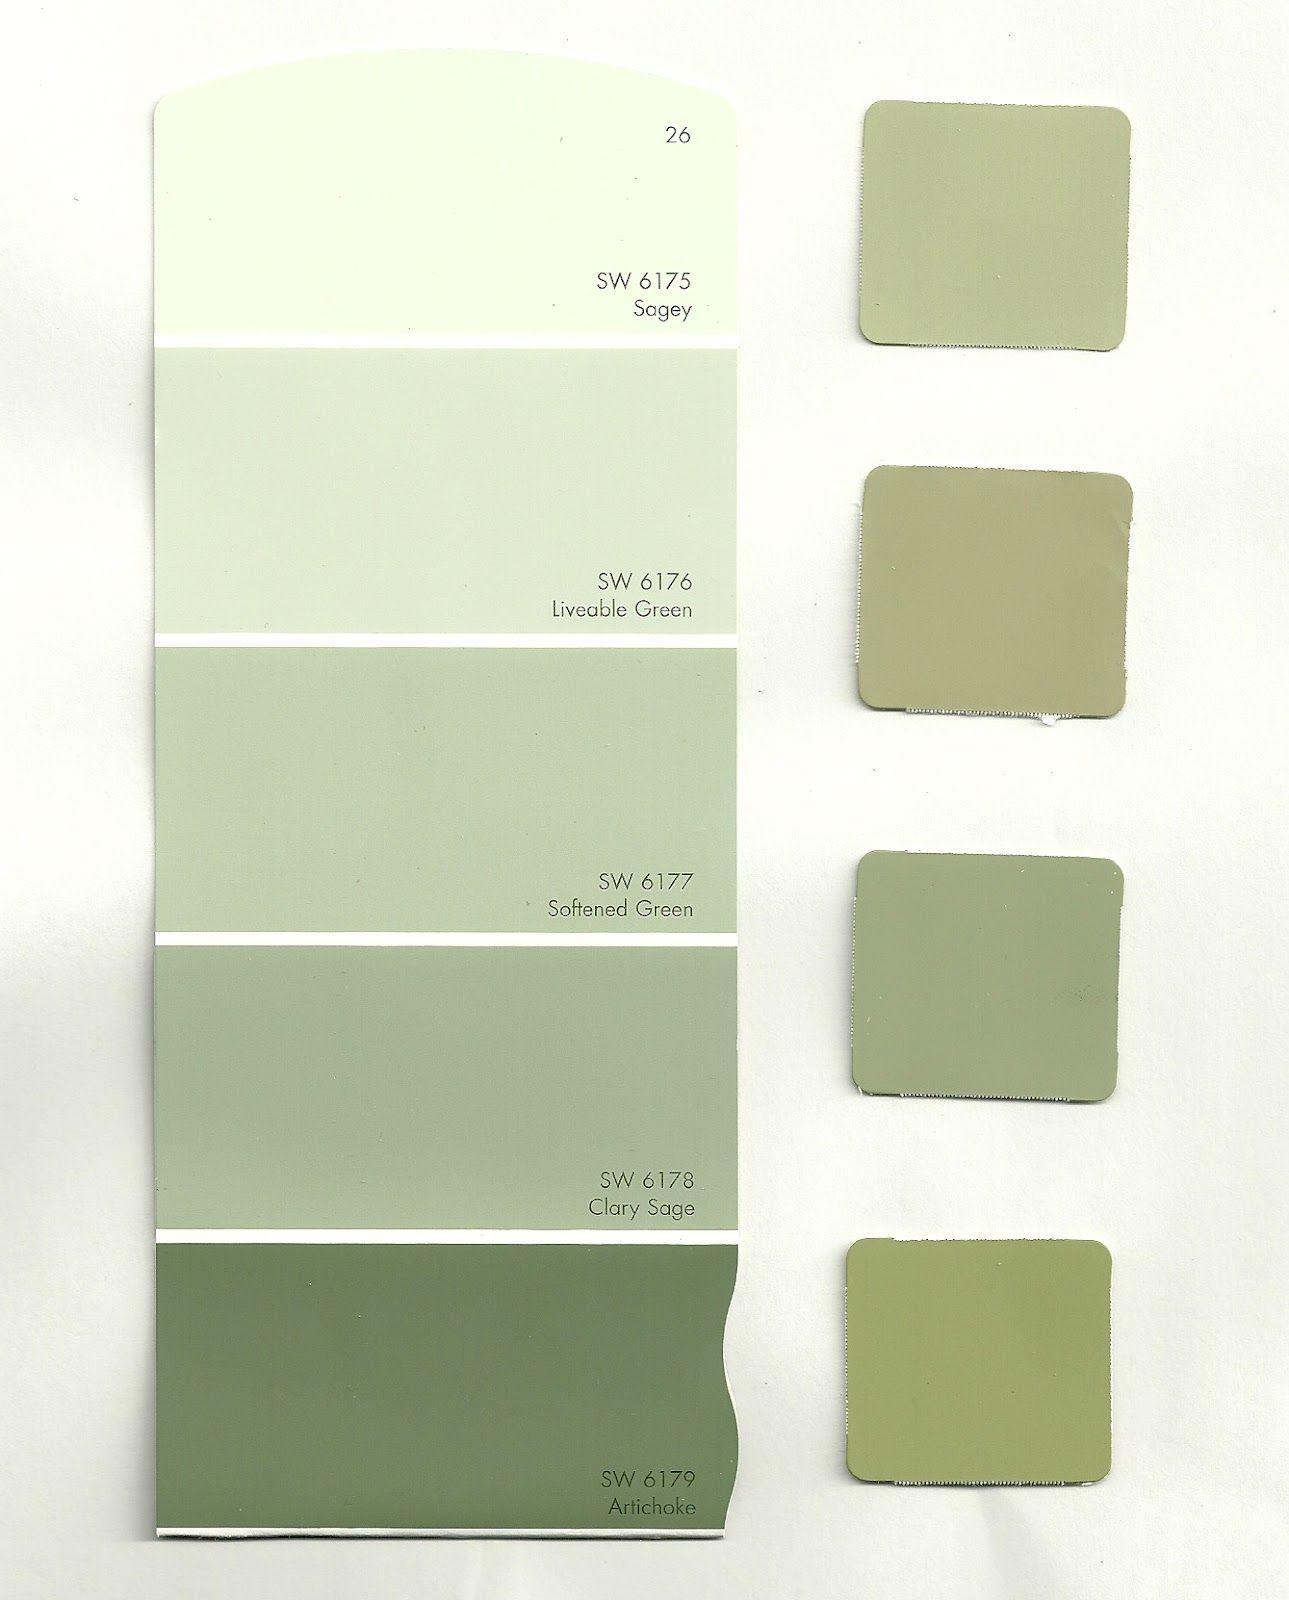 Brady S Room Color Ideas Walls Sage Color Yellow Green Brown